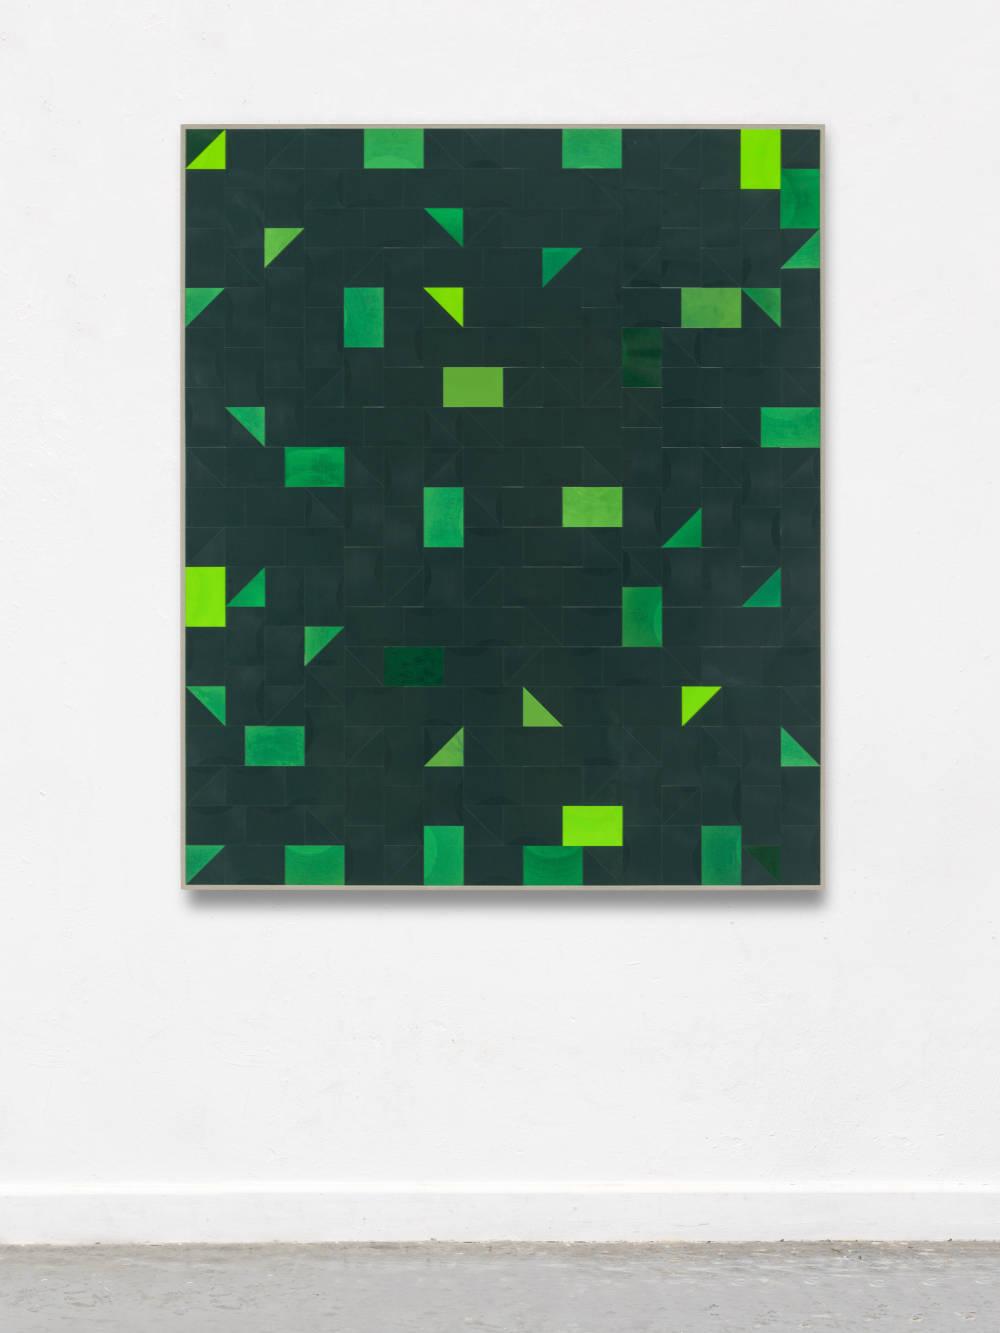 Gregor Hildebrandt, erstes grün, 2018. Cut vinyl records, acrylic, canvas, wood 154 x 130 cm, 60.6 x 11.8 in. Courtesy of the artist and Perrotin.